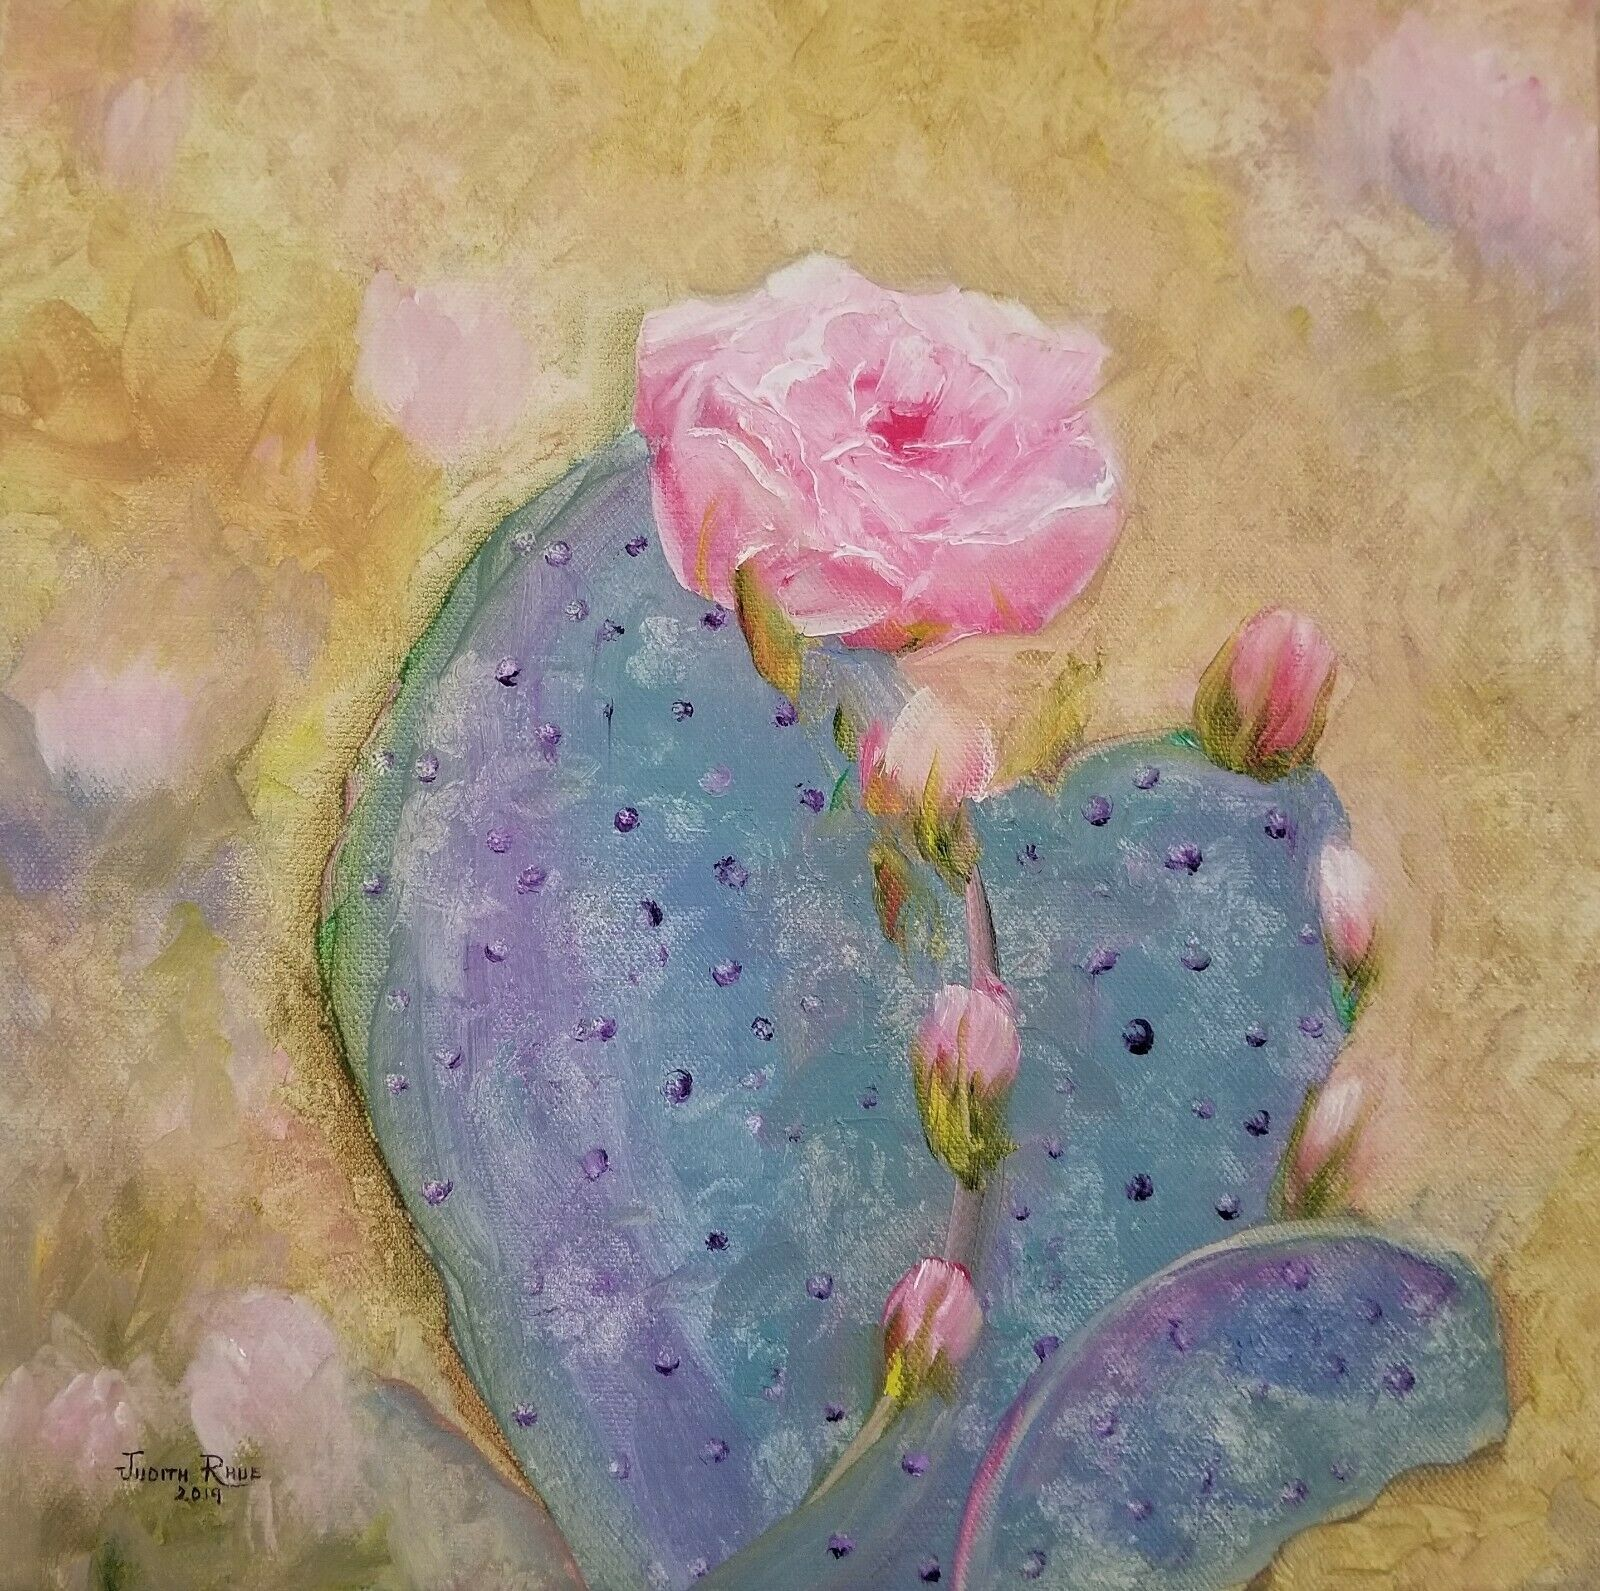 Original Oil Painting Cactus Prickly Pear Flower Desert Arizona Canvas Signed  - $300.00